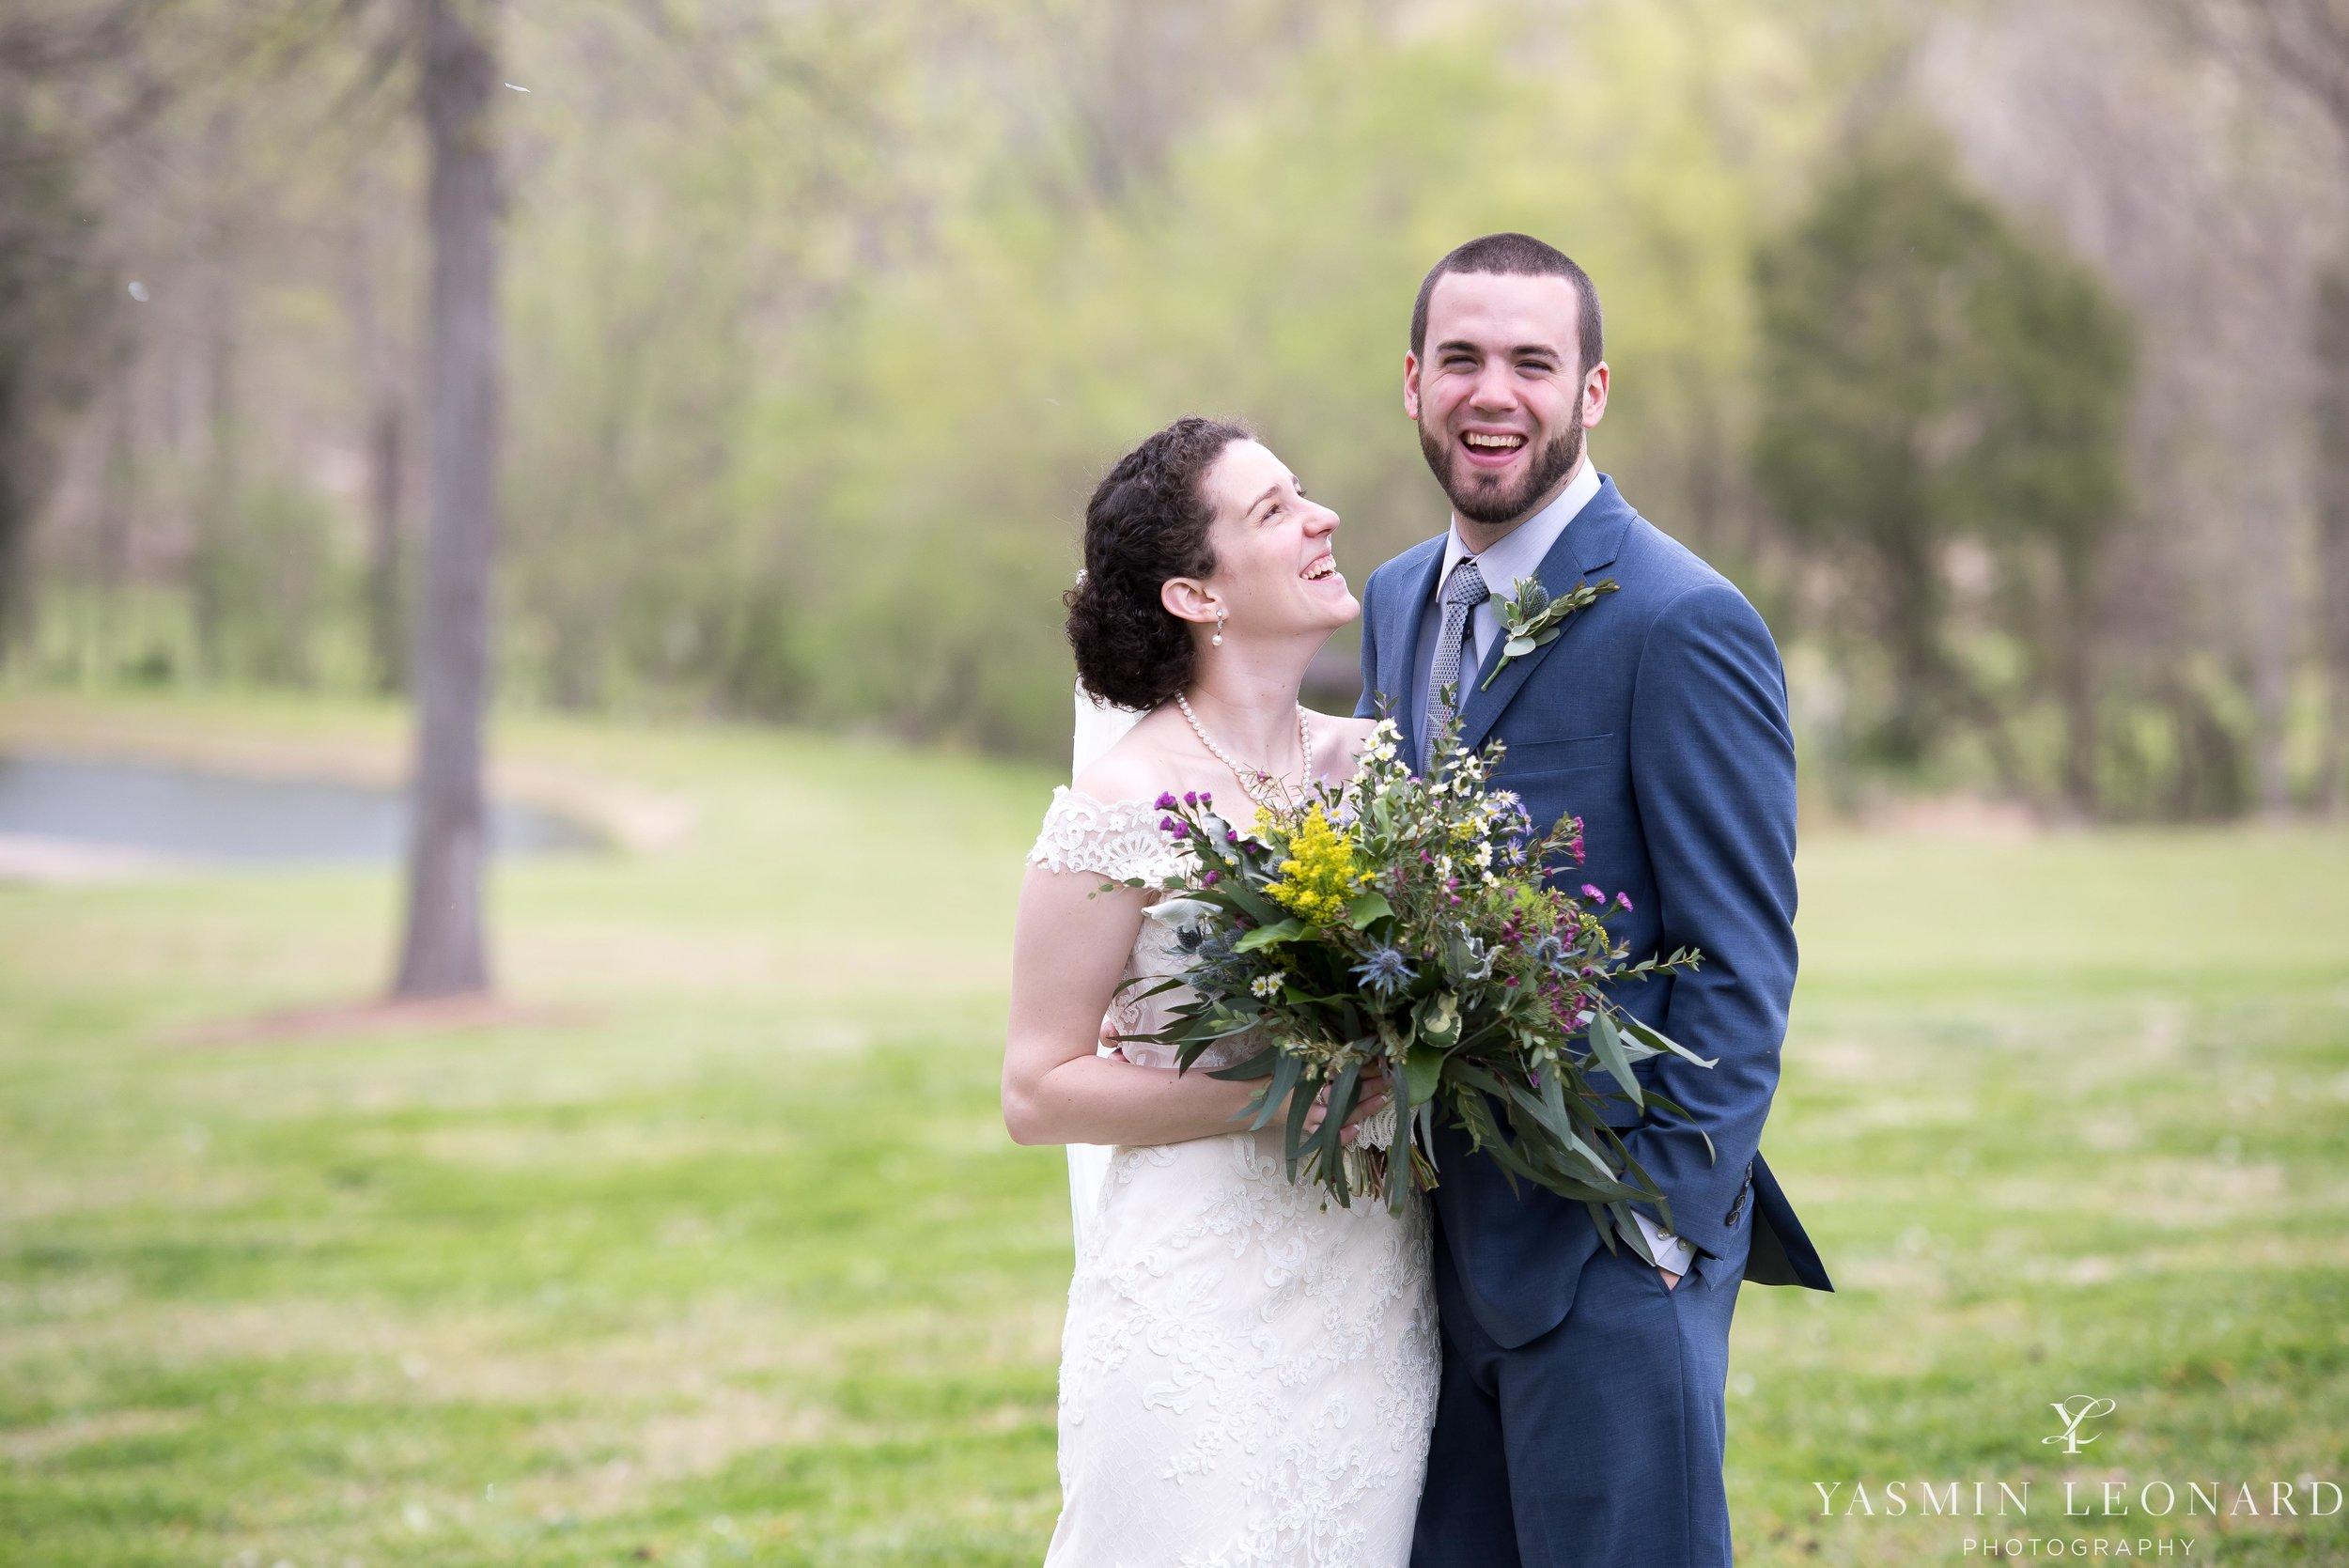 Courtney and Justin - L'abri at Linwood - Yasmin Leonard Photography-41.jpg